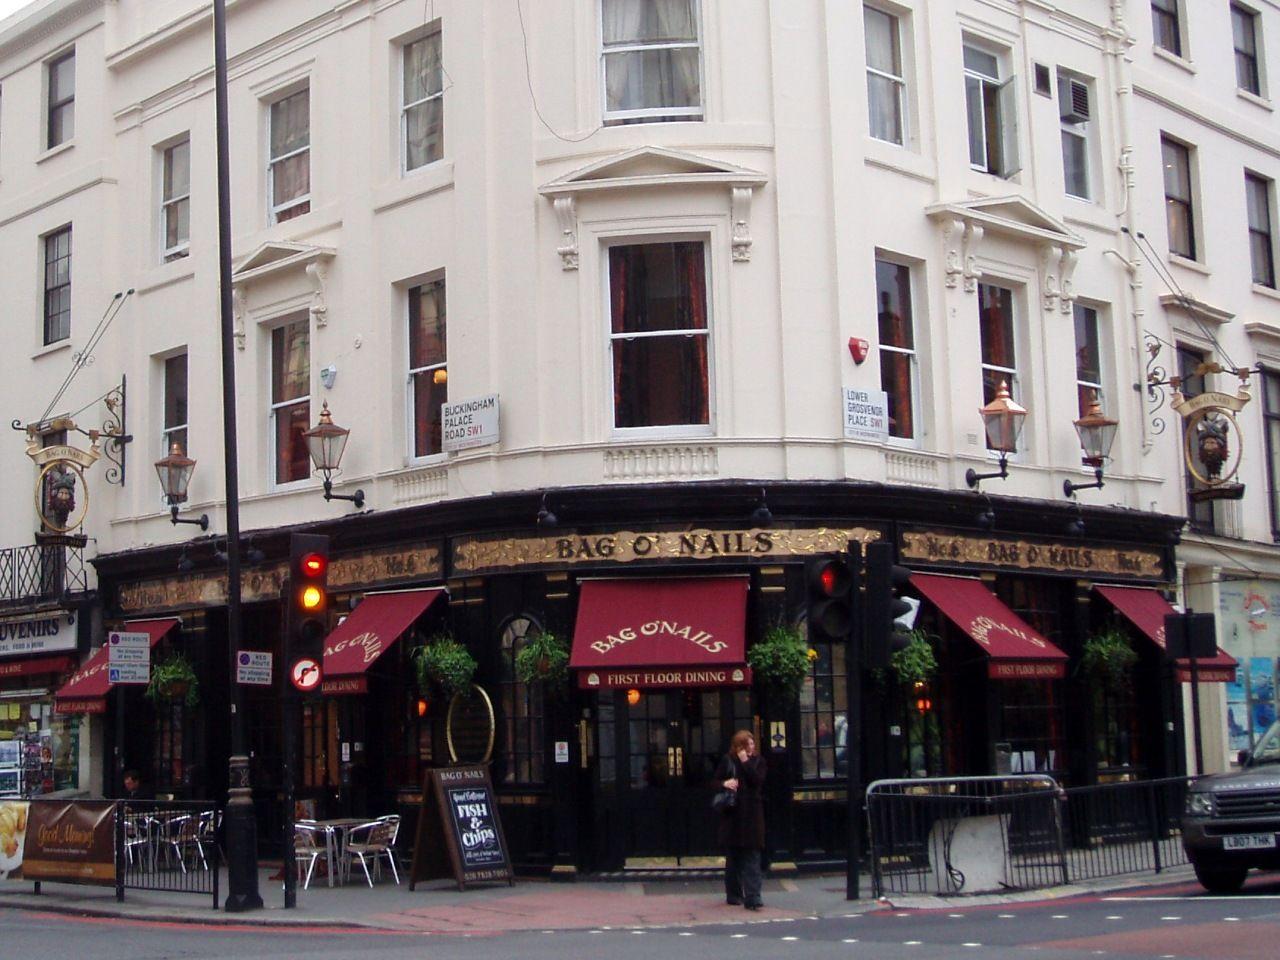 Bag O Nails Taylor Walker London Pubs Pub Crawl England Travel